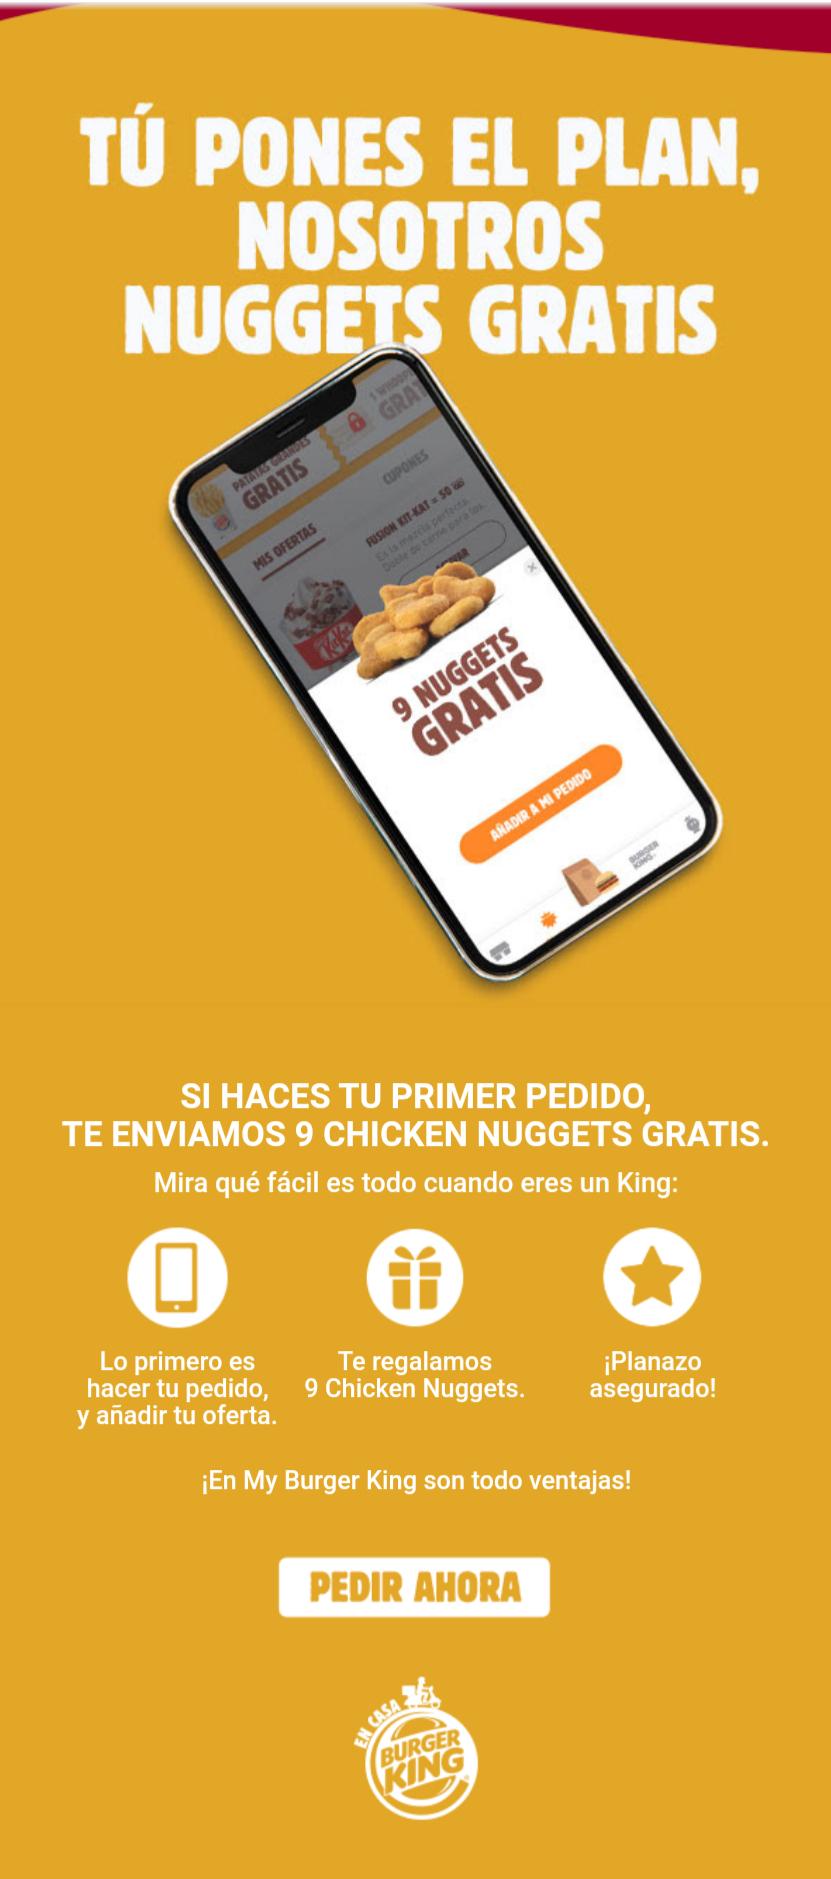 9 Nuggets gratis en tu primer pedido en Burger King